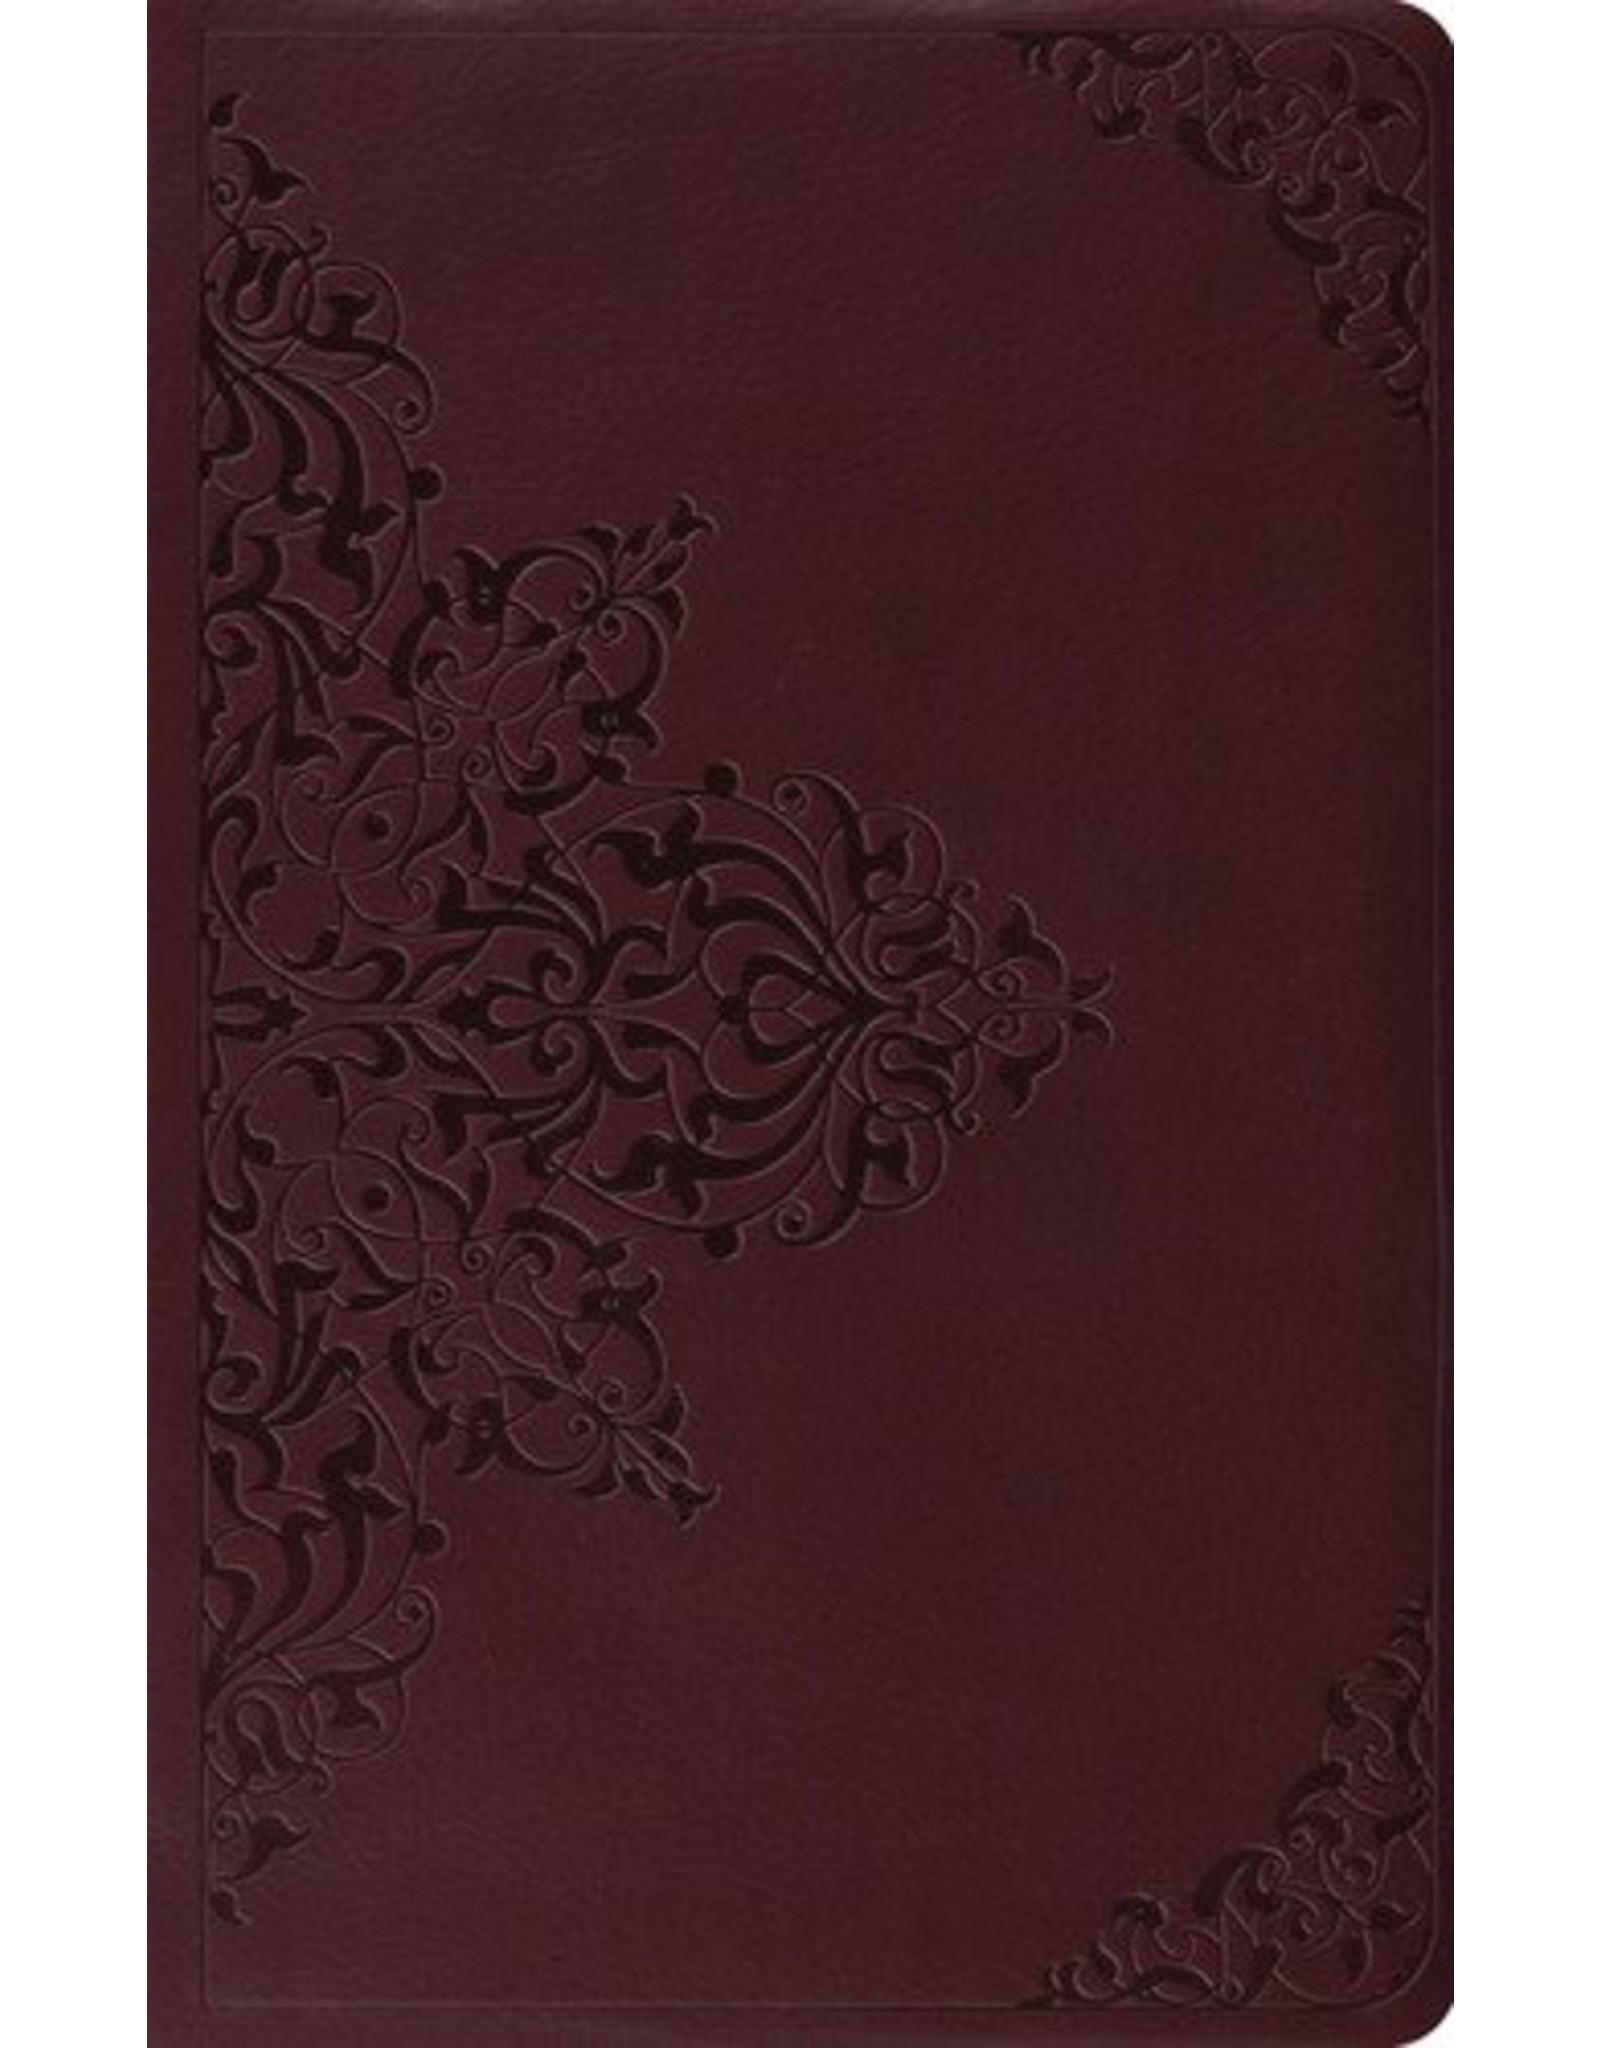 Crossway / Good News ESV Premium Gift Bible chestnut, filigree Design